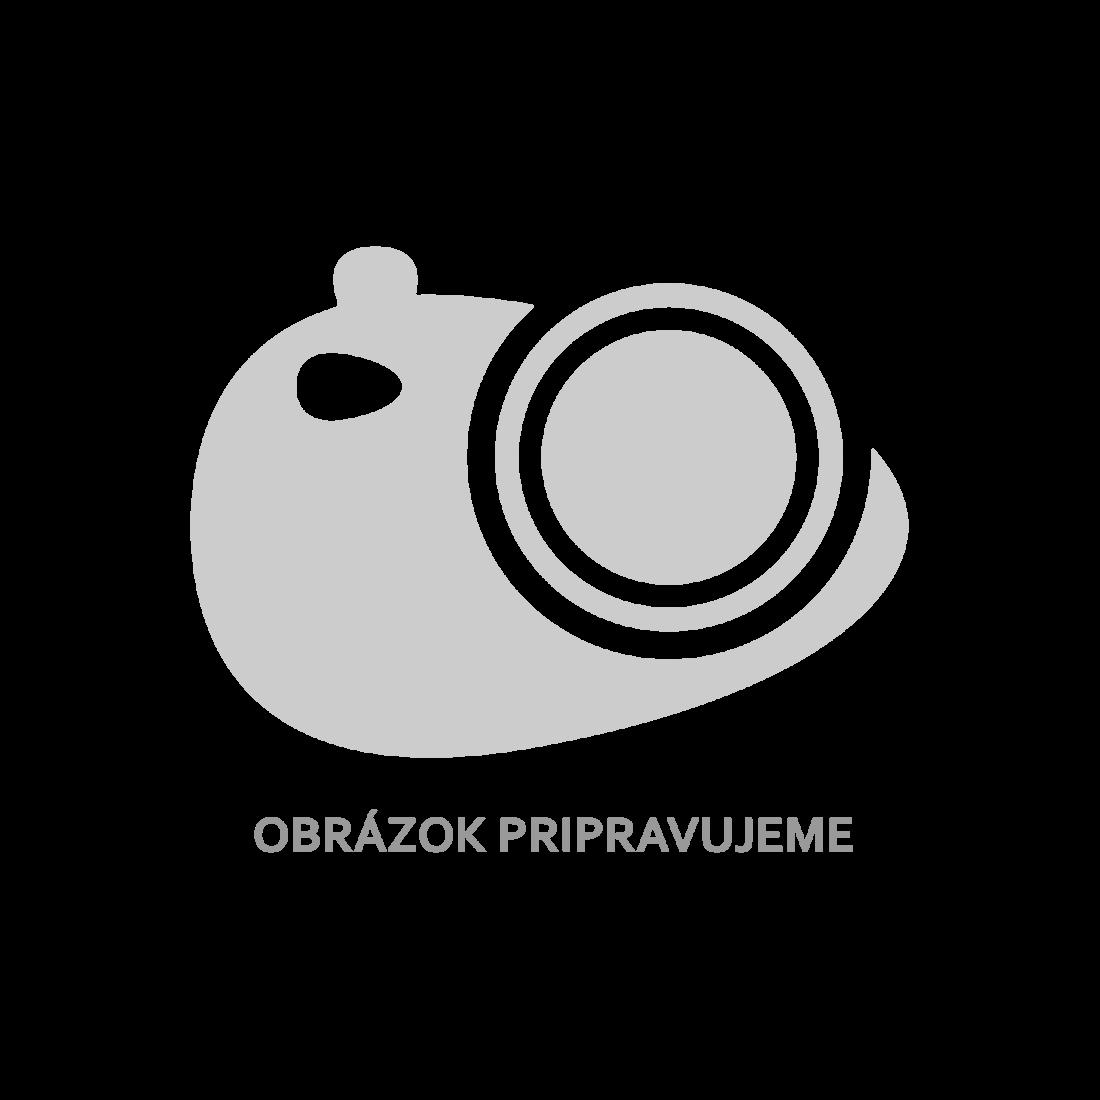 vidaXL 3dílná sada dětského tabulového stolu a židlí černobílá [286189]